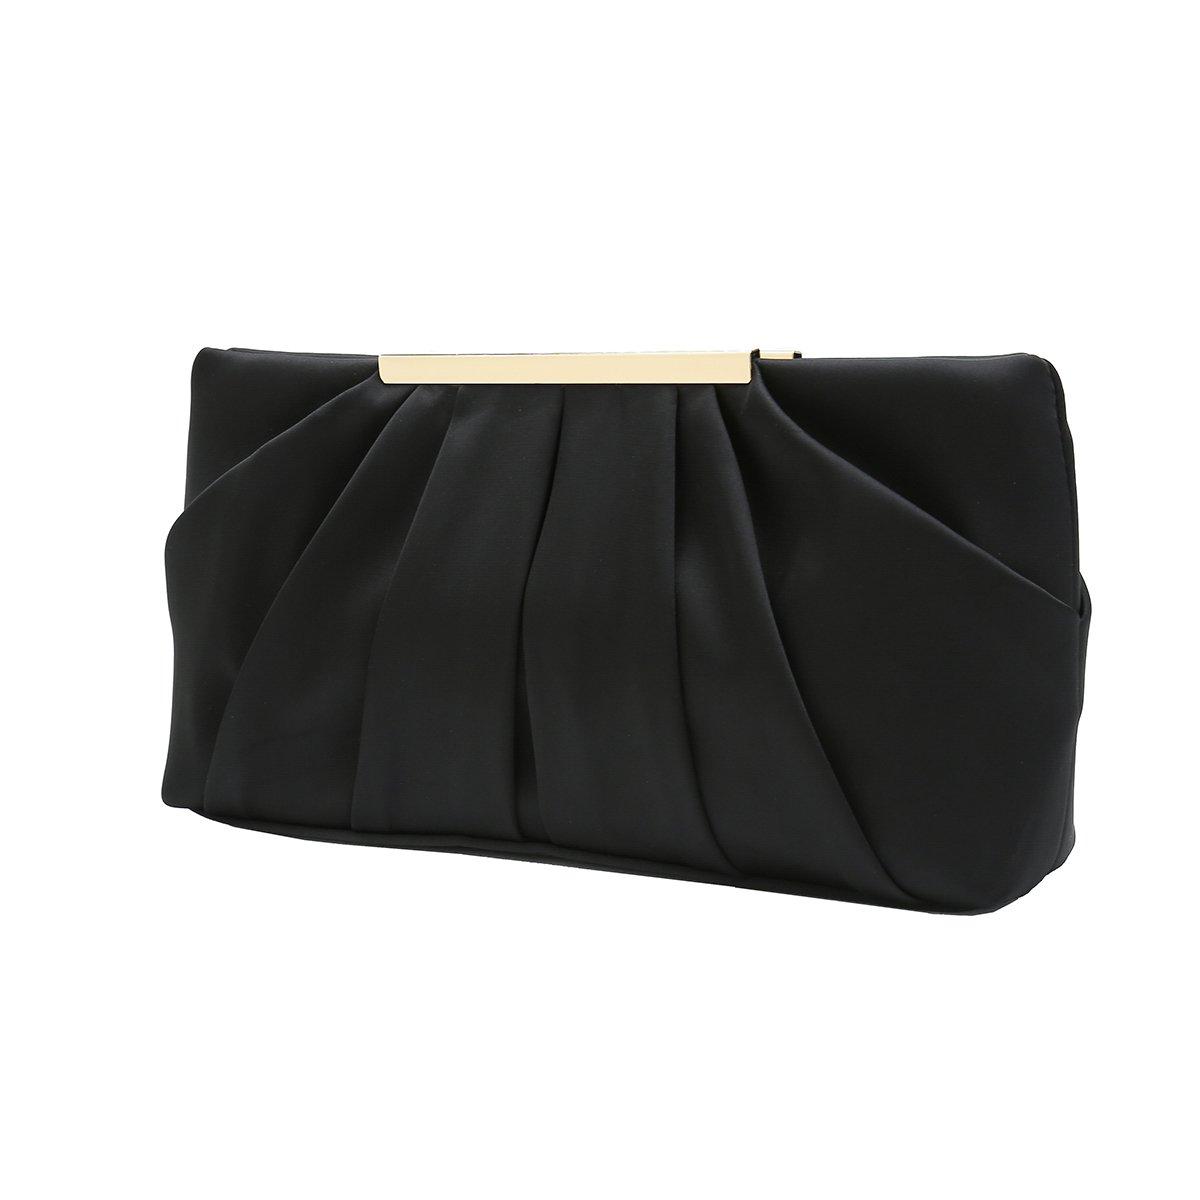 Charming Tailor Clutch Evening Bag Elegant Pleated Satin Formal Handbag Simple Classy Purse for Women (Black)